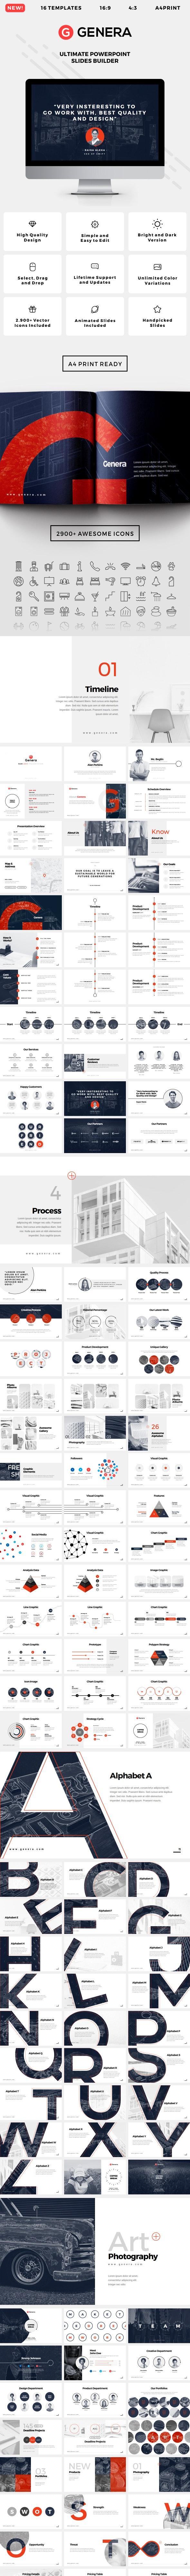 Genera - PowerPoint Slides Builder - Business PowerPoint Templates